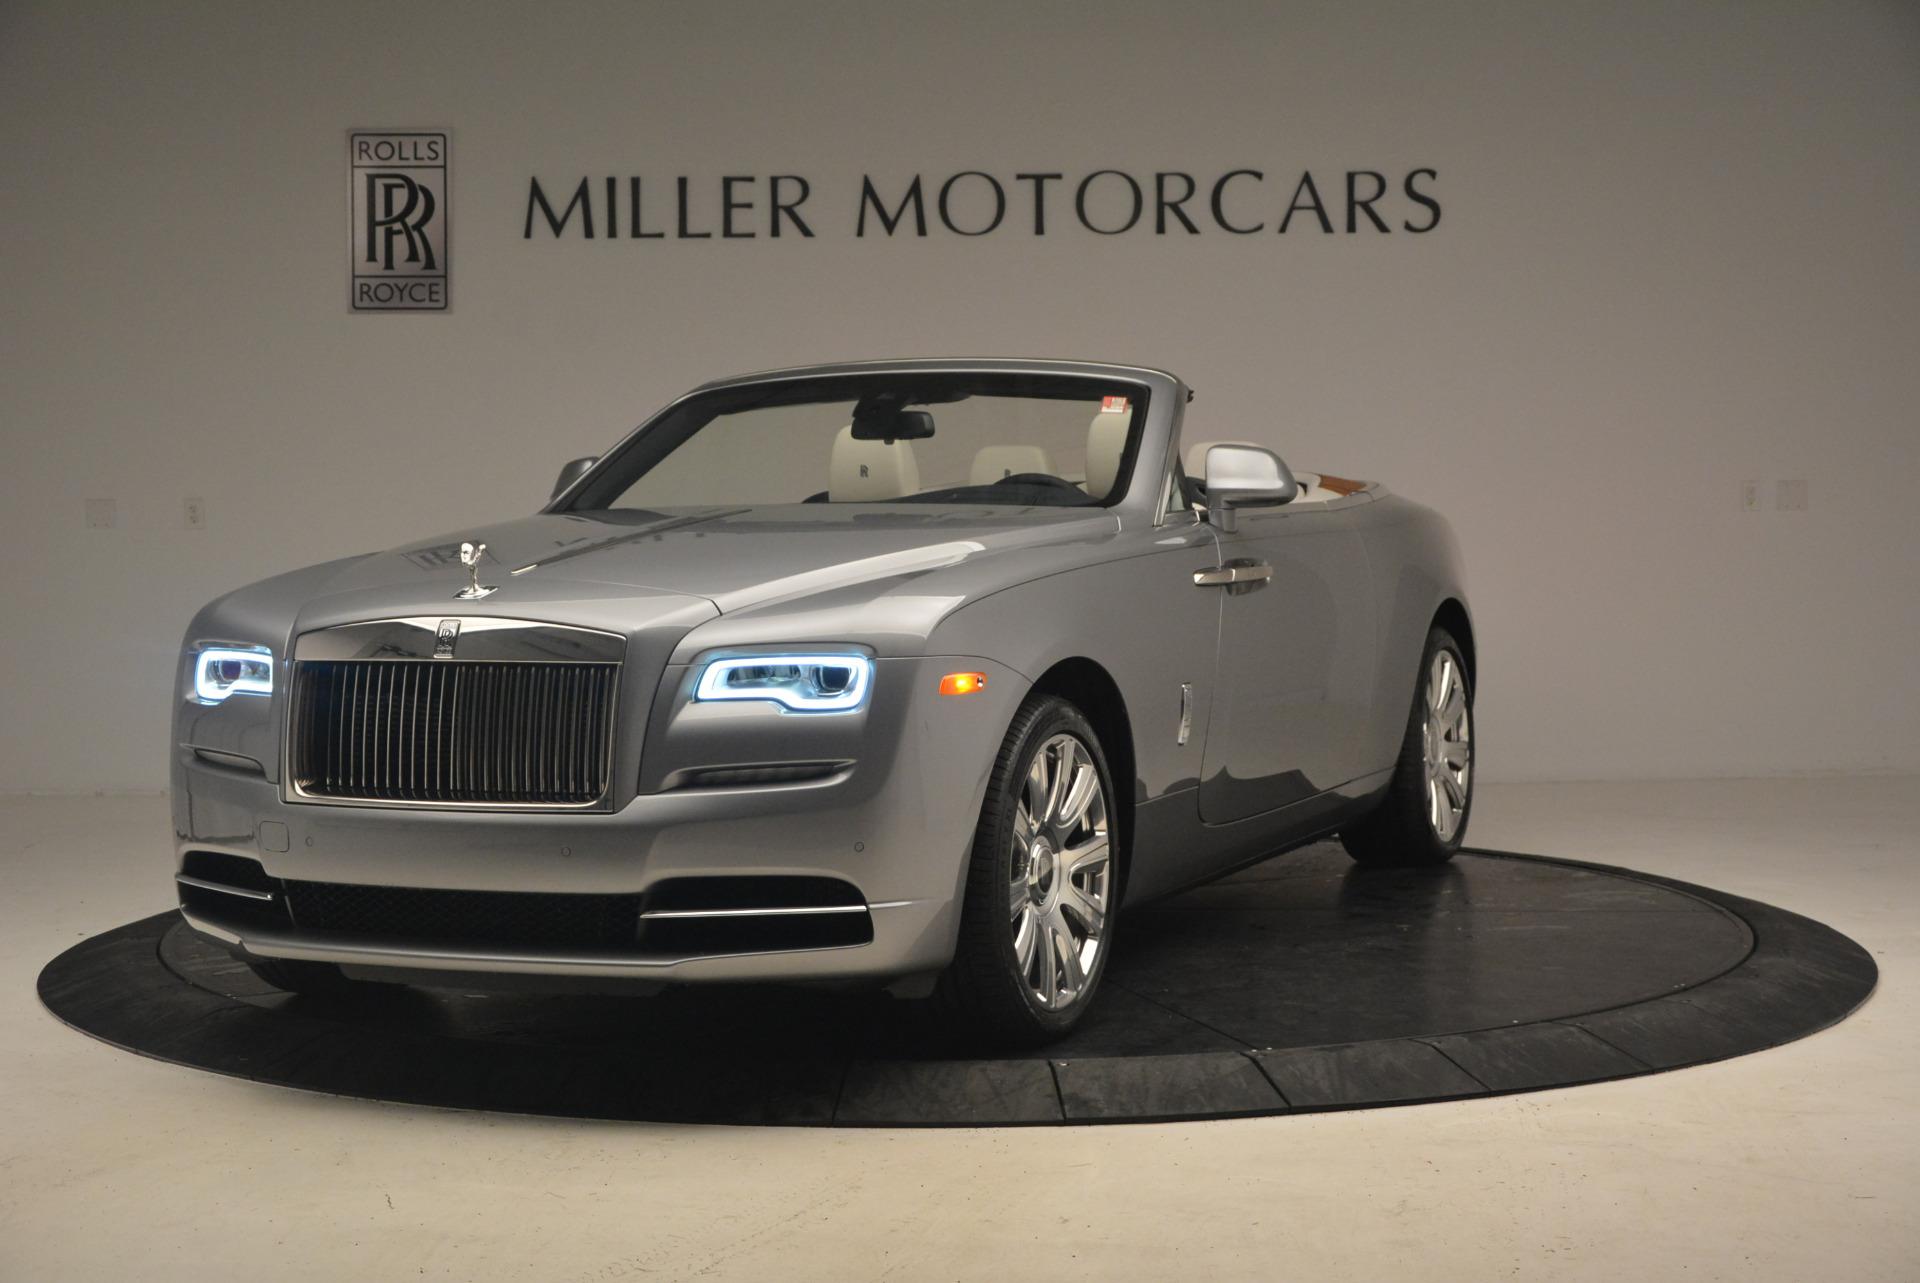 Used 2017 Rolls-Royce Dawn for sale $245,900 at Maserati of Westport in Westport CT 06880 1